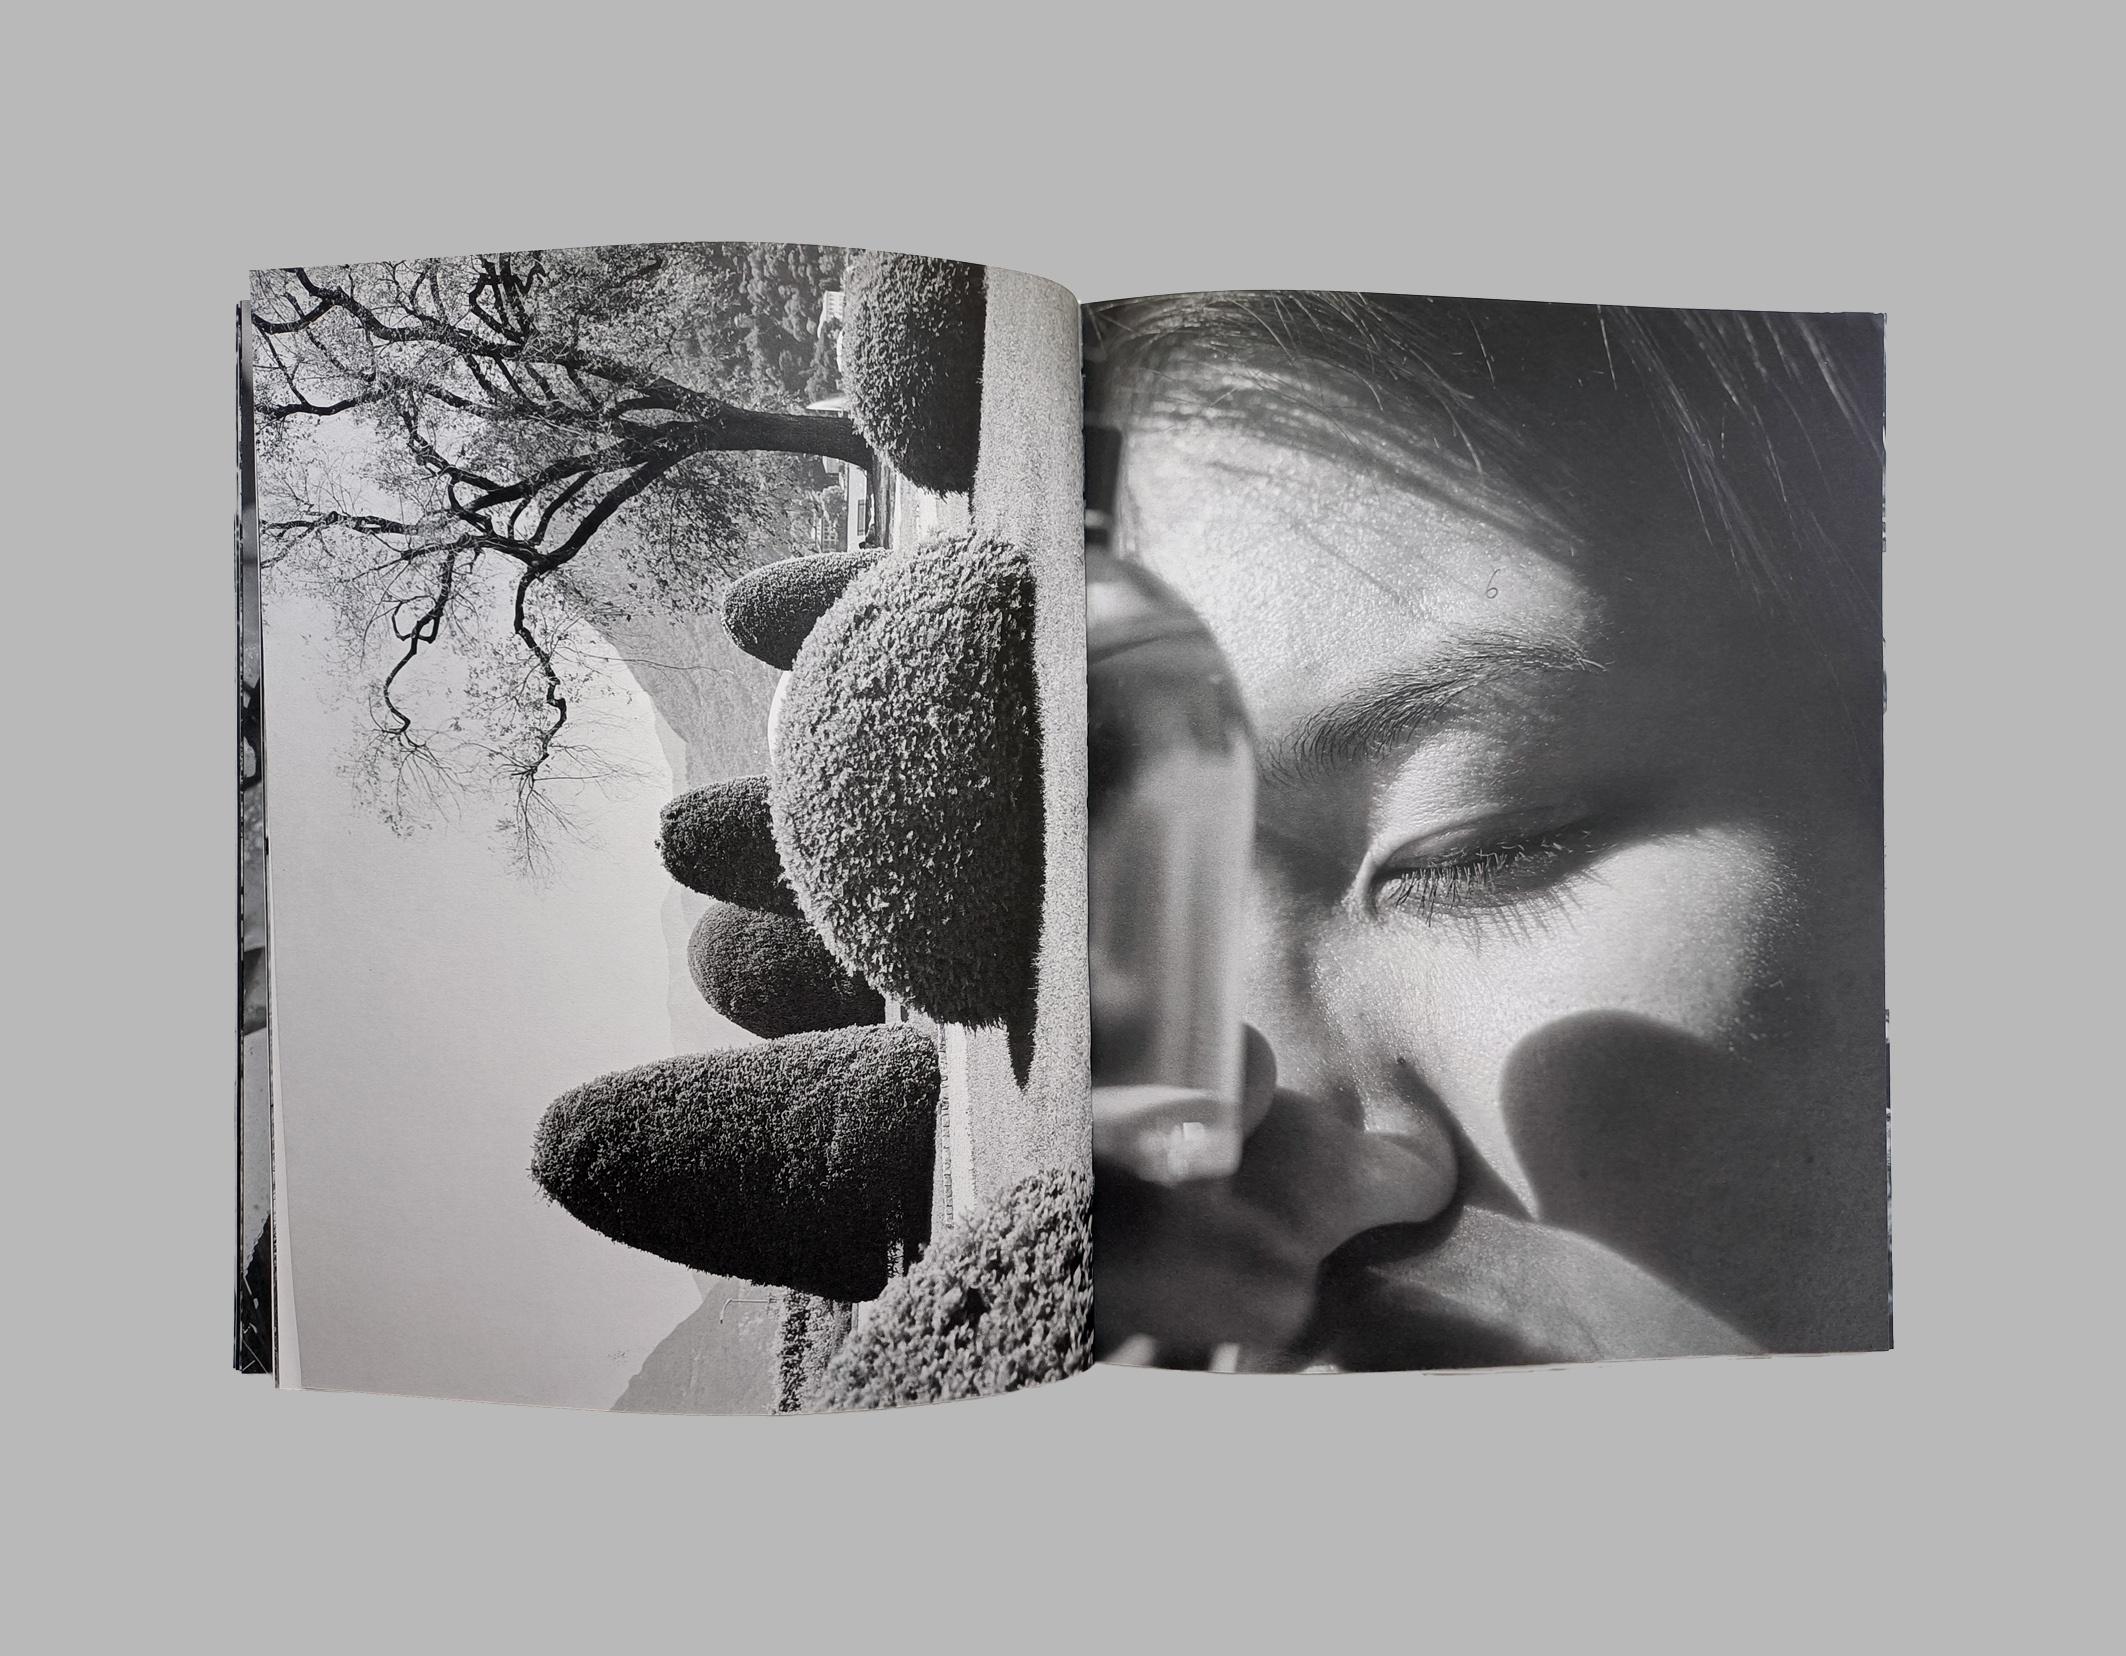 Mattia Parodi & Piergiorgio Sorgetti: The Missing Eye